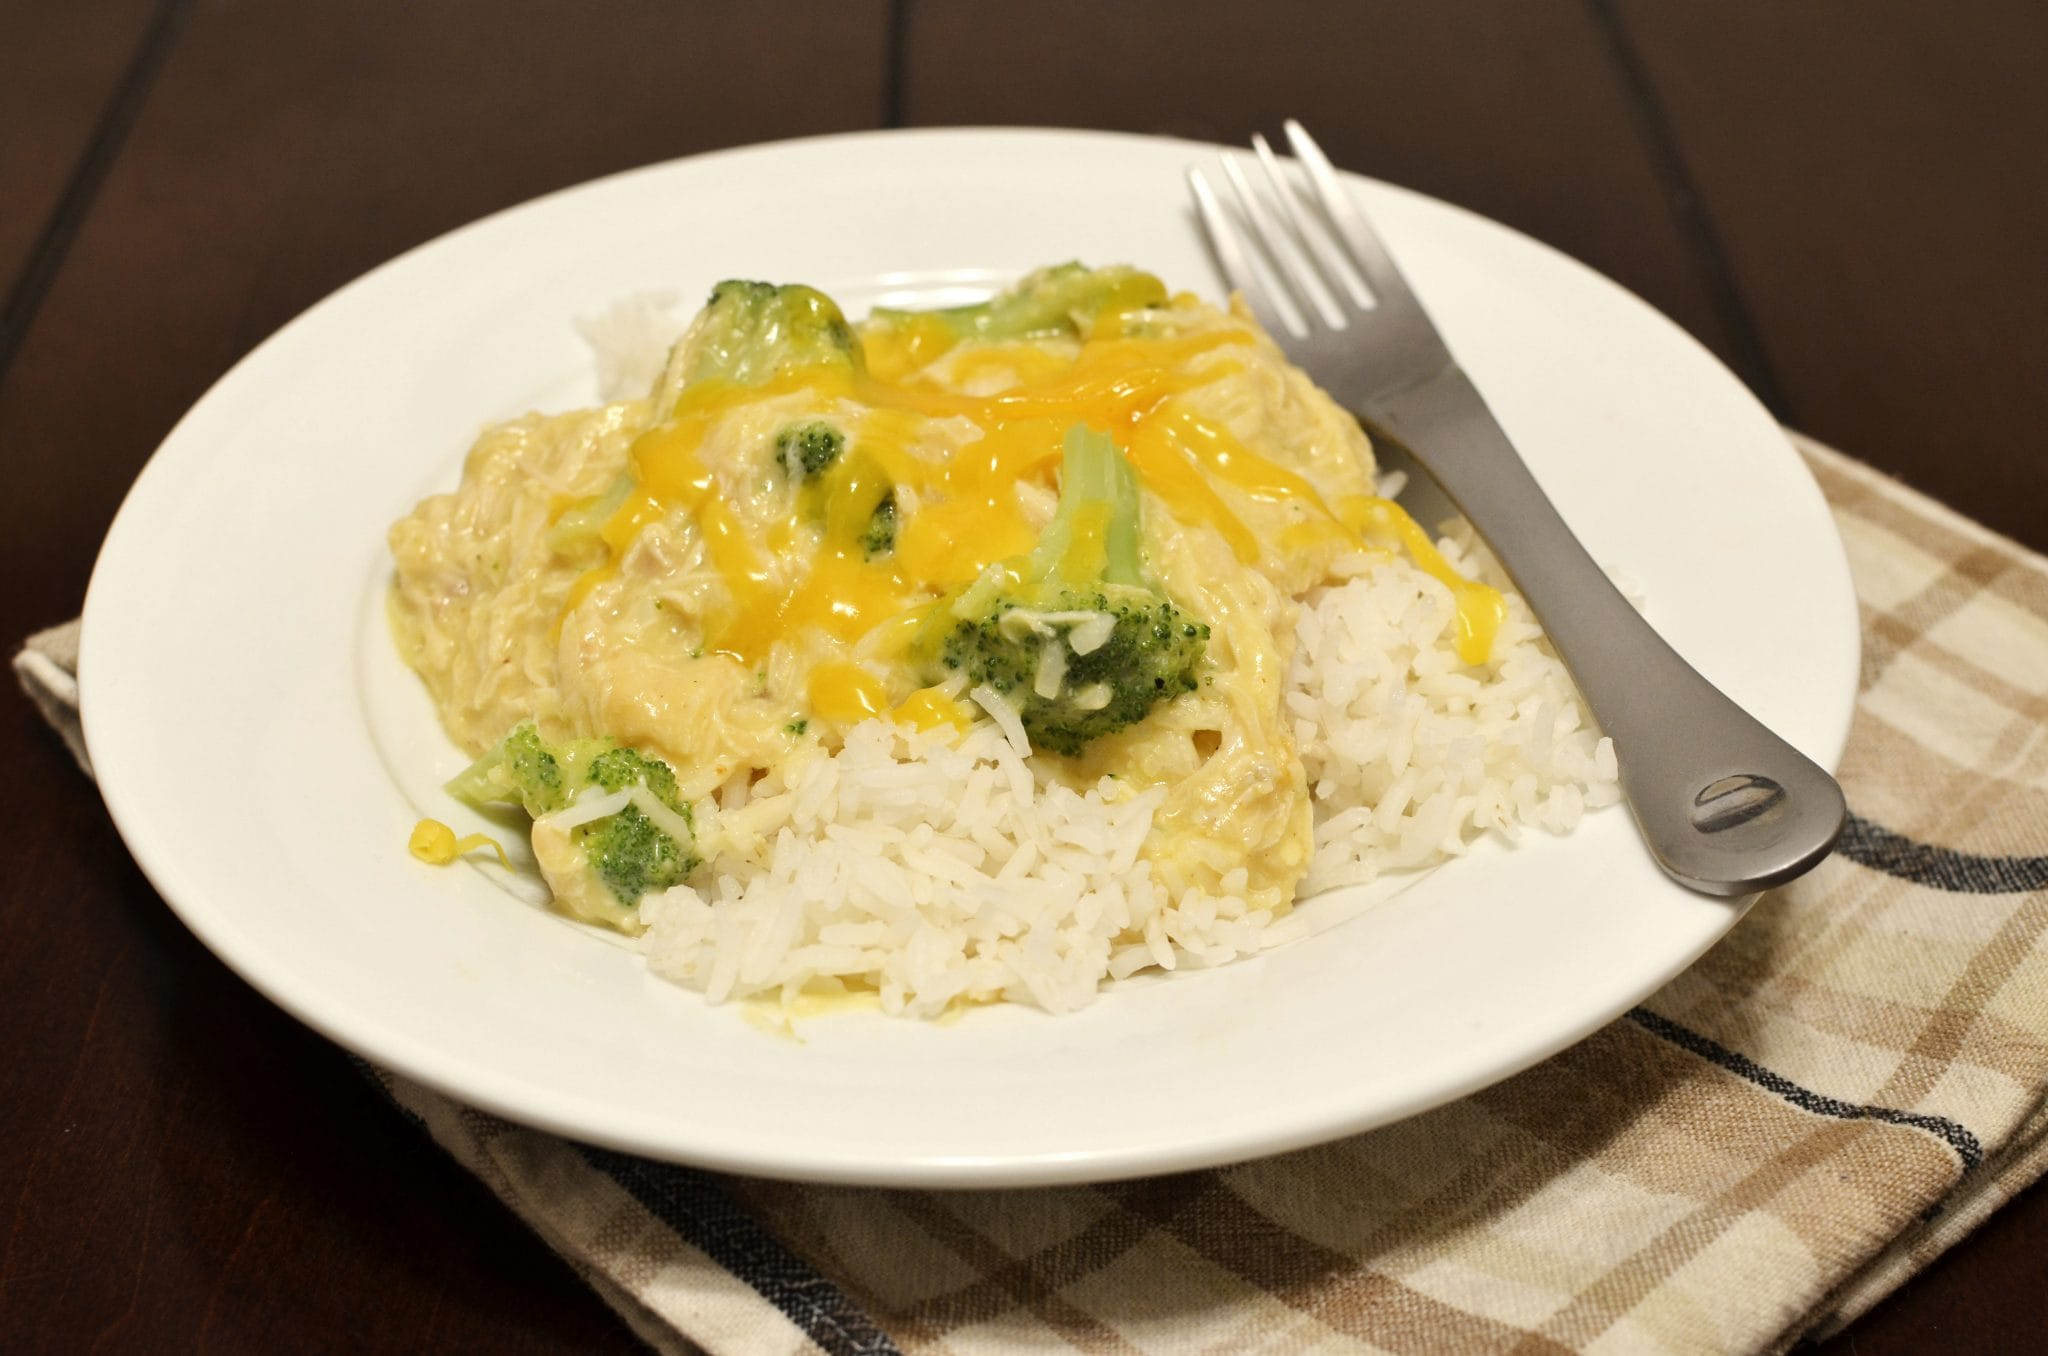 Creamy Chicken and Broccoli over Rice